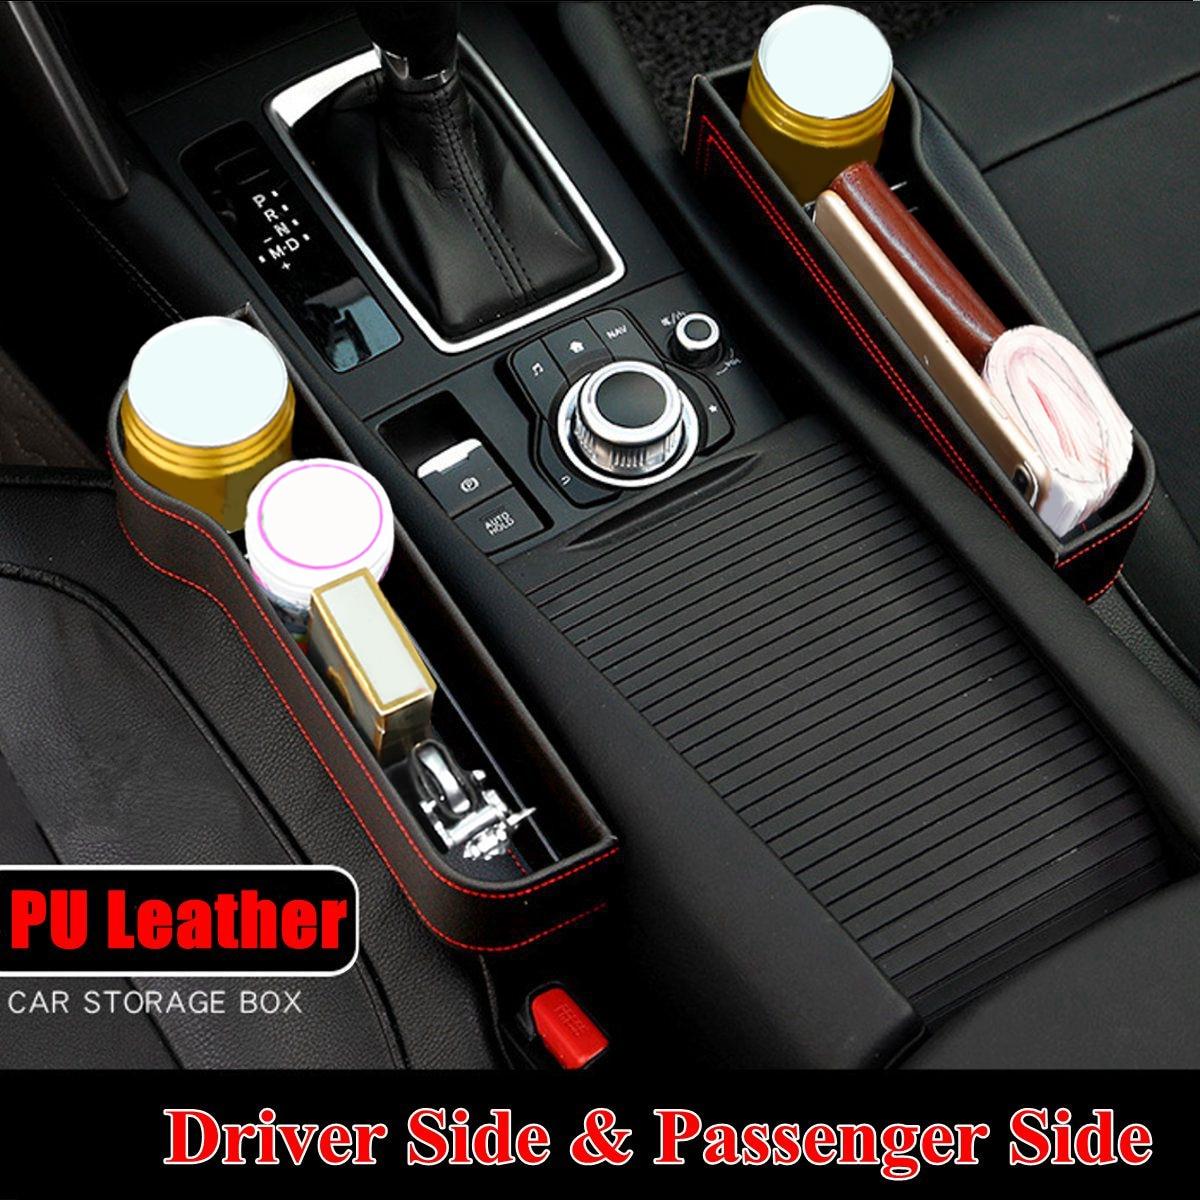 Left/Right Universal Pair Passenger Driver Side Car Seat Gap Storage Box for Pocket Organizer Phone Holders Black/Beige/Red 1